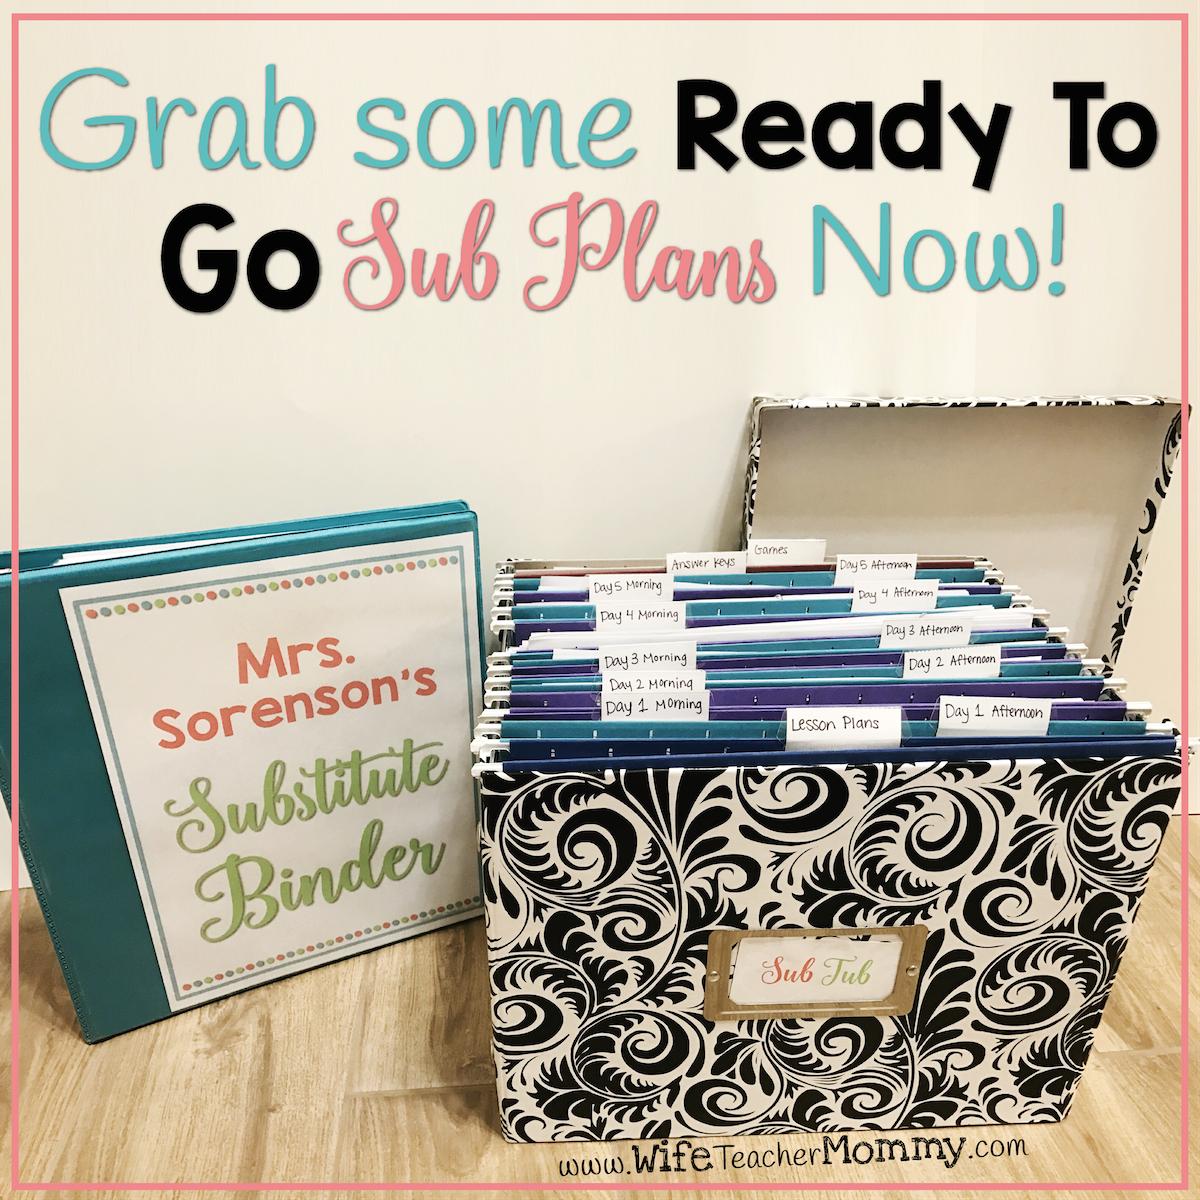 Organize Your Perfect Sub Tub